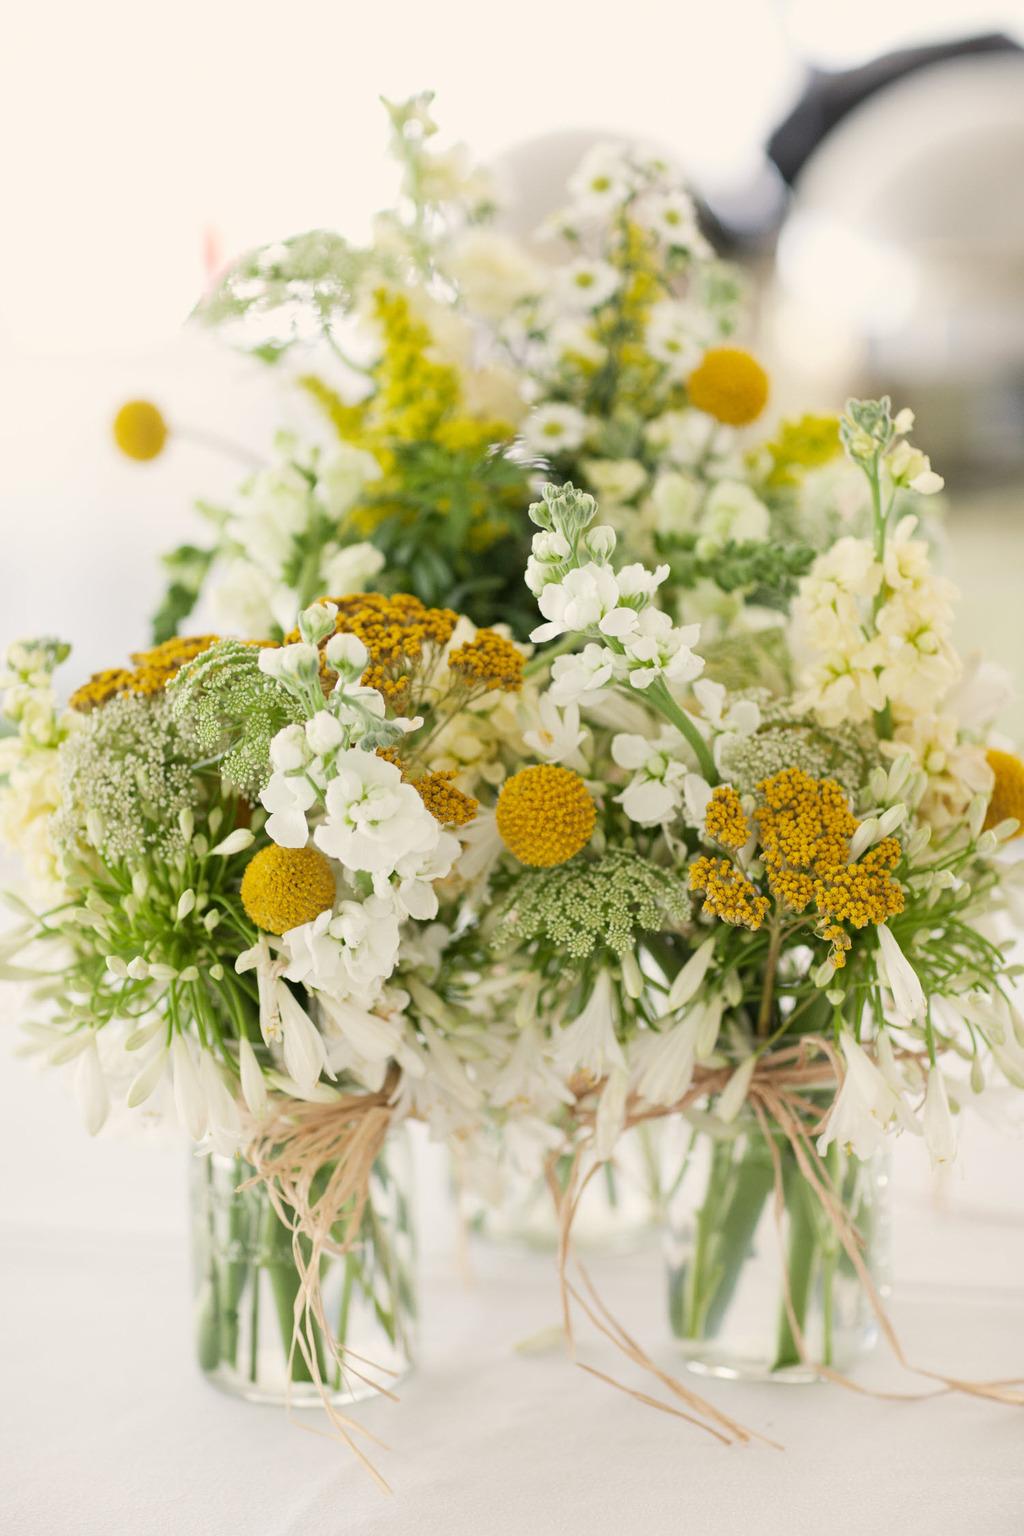 Outdoor-spring-wedding-yellow-white-wedding-flower-centerpieces.full